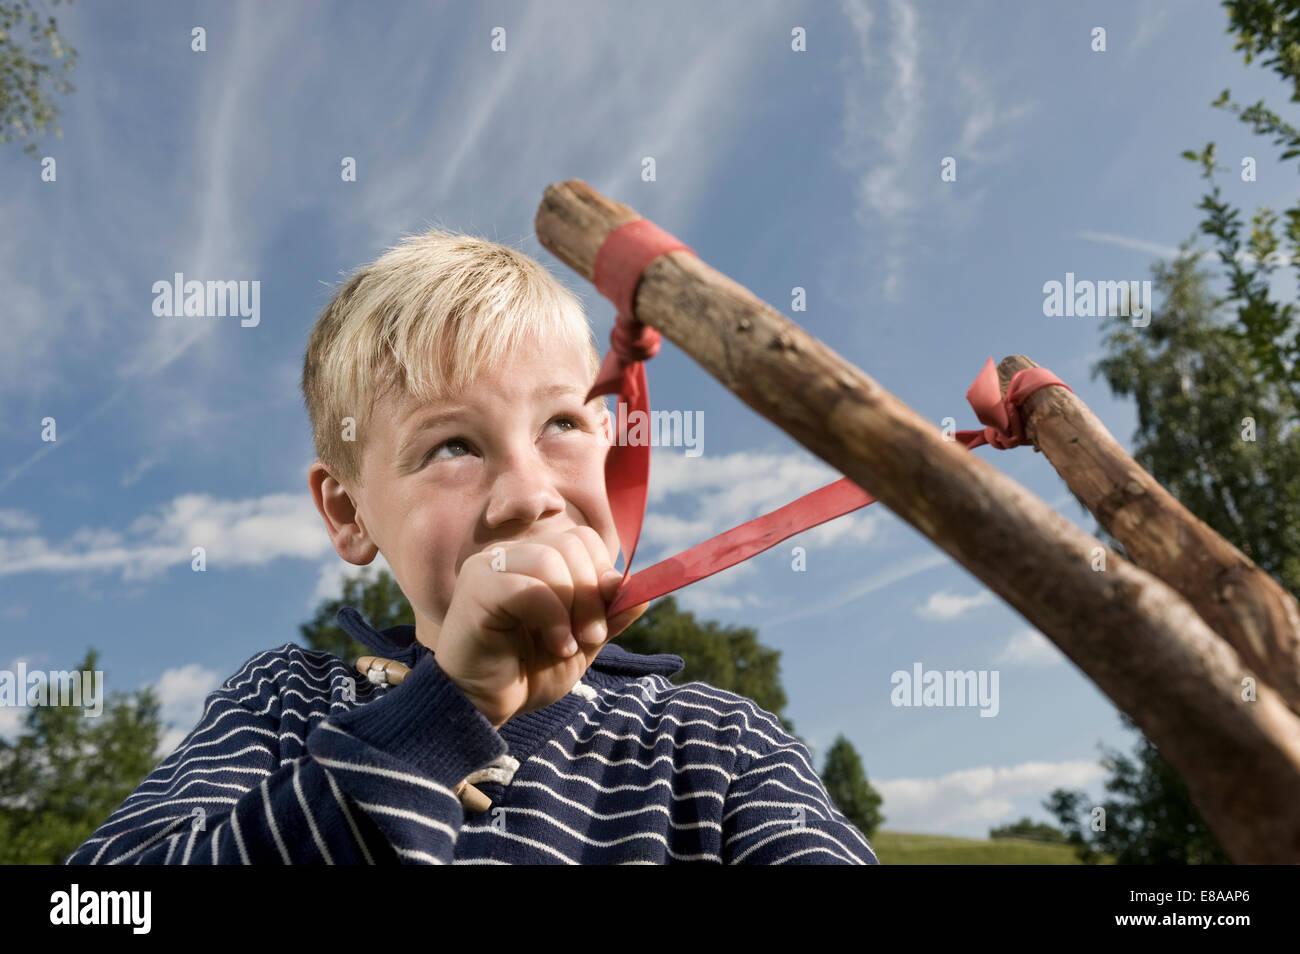 Boy aim slingshot sky holding portrait - Stock Image